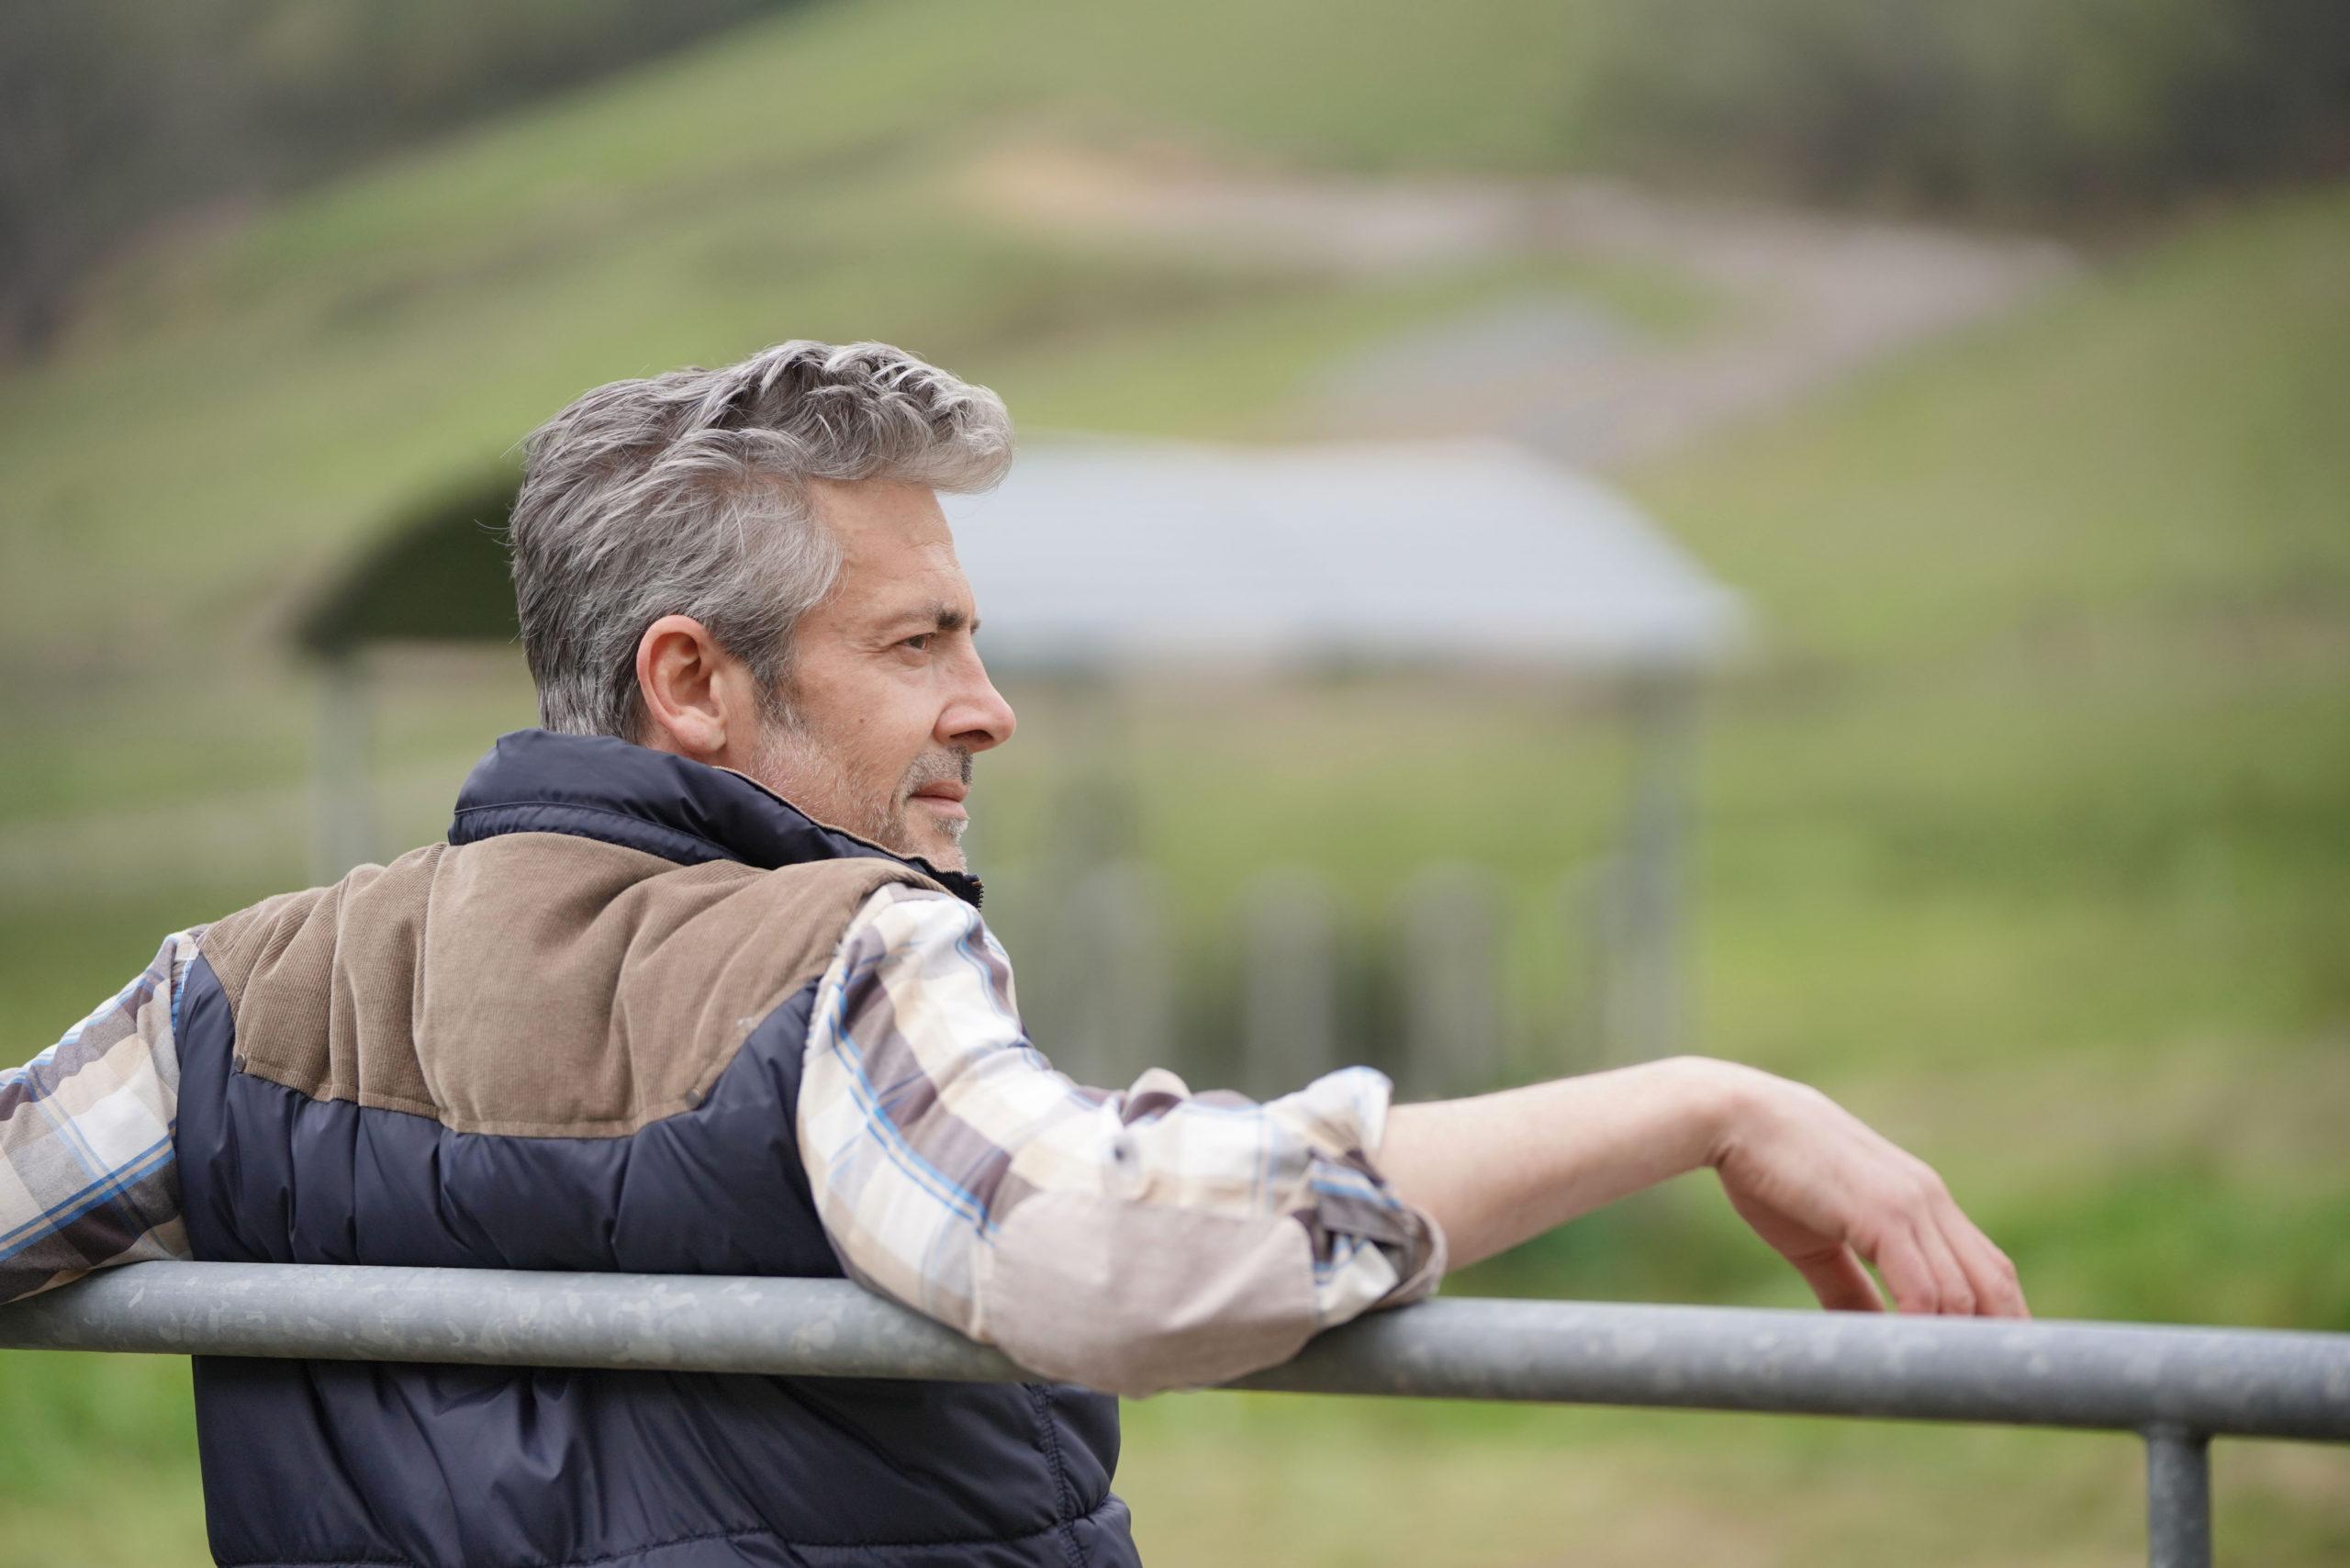 acreage owner leaning on fence